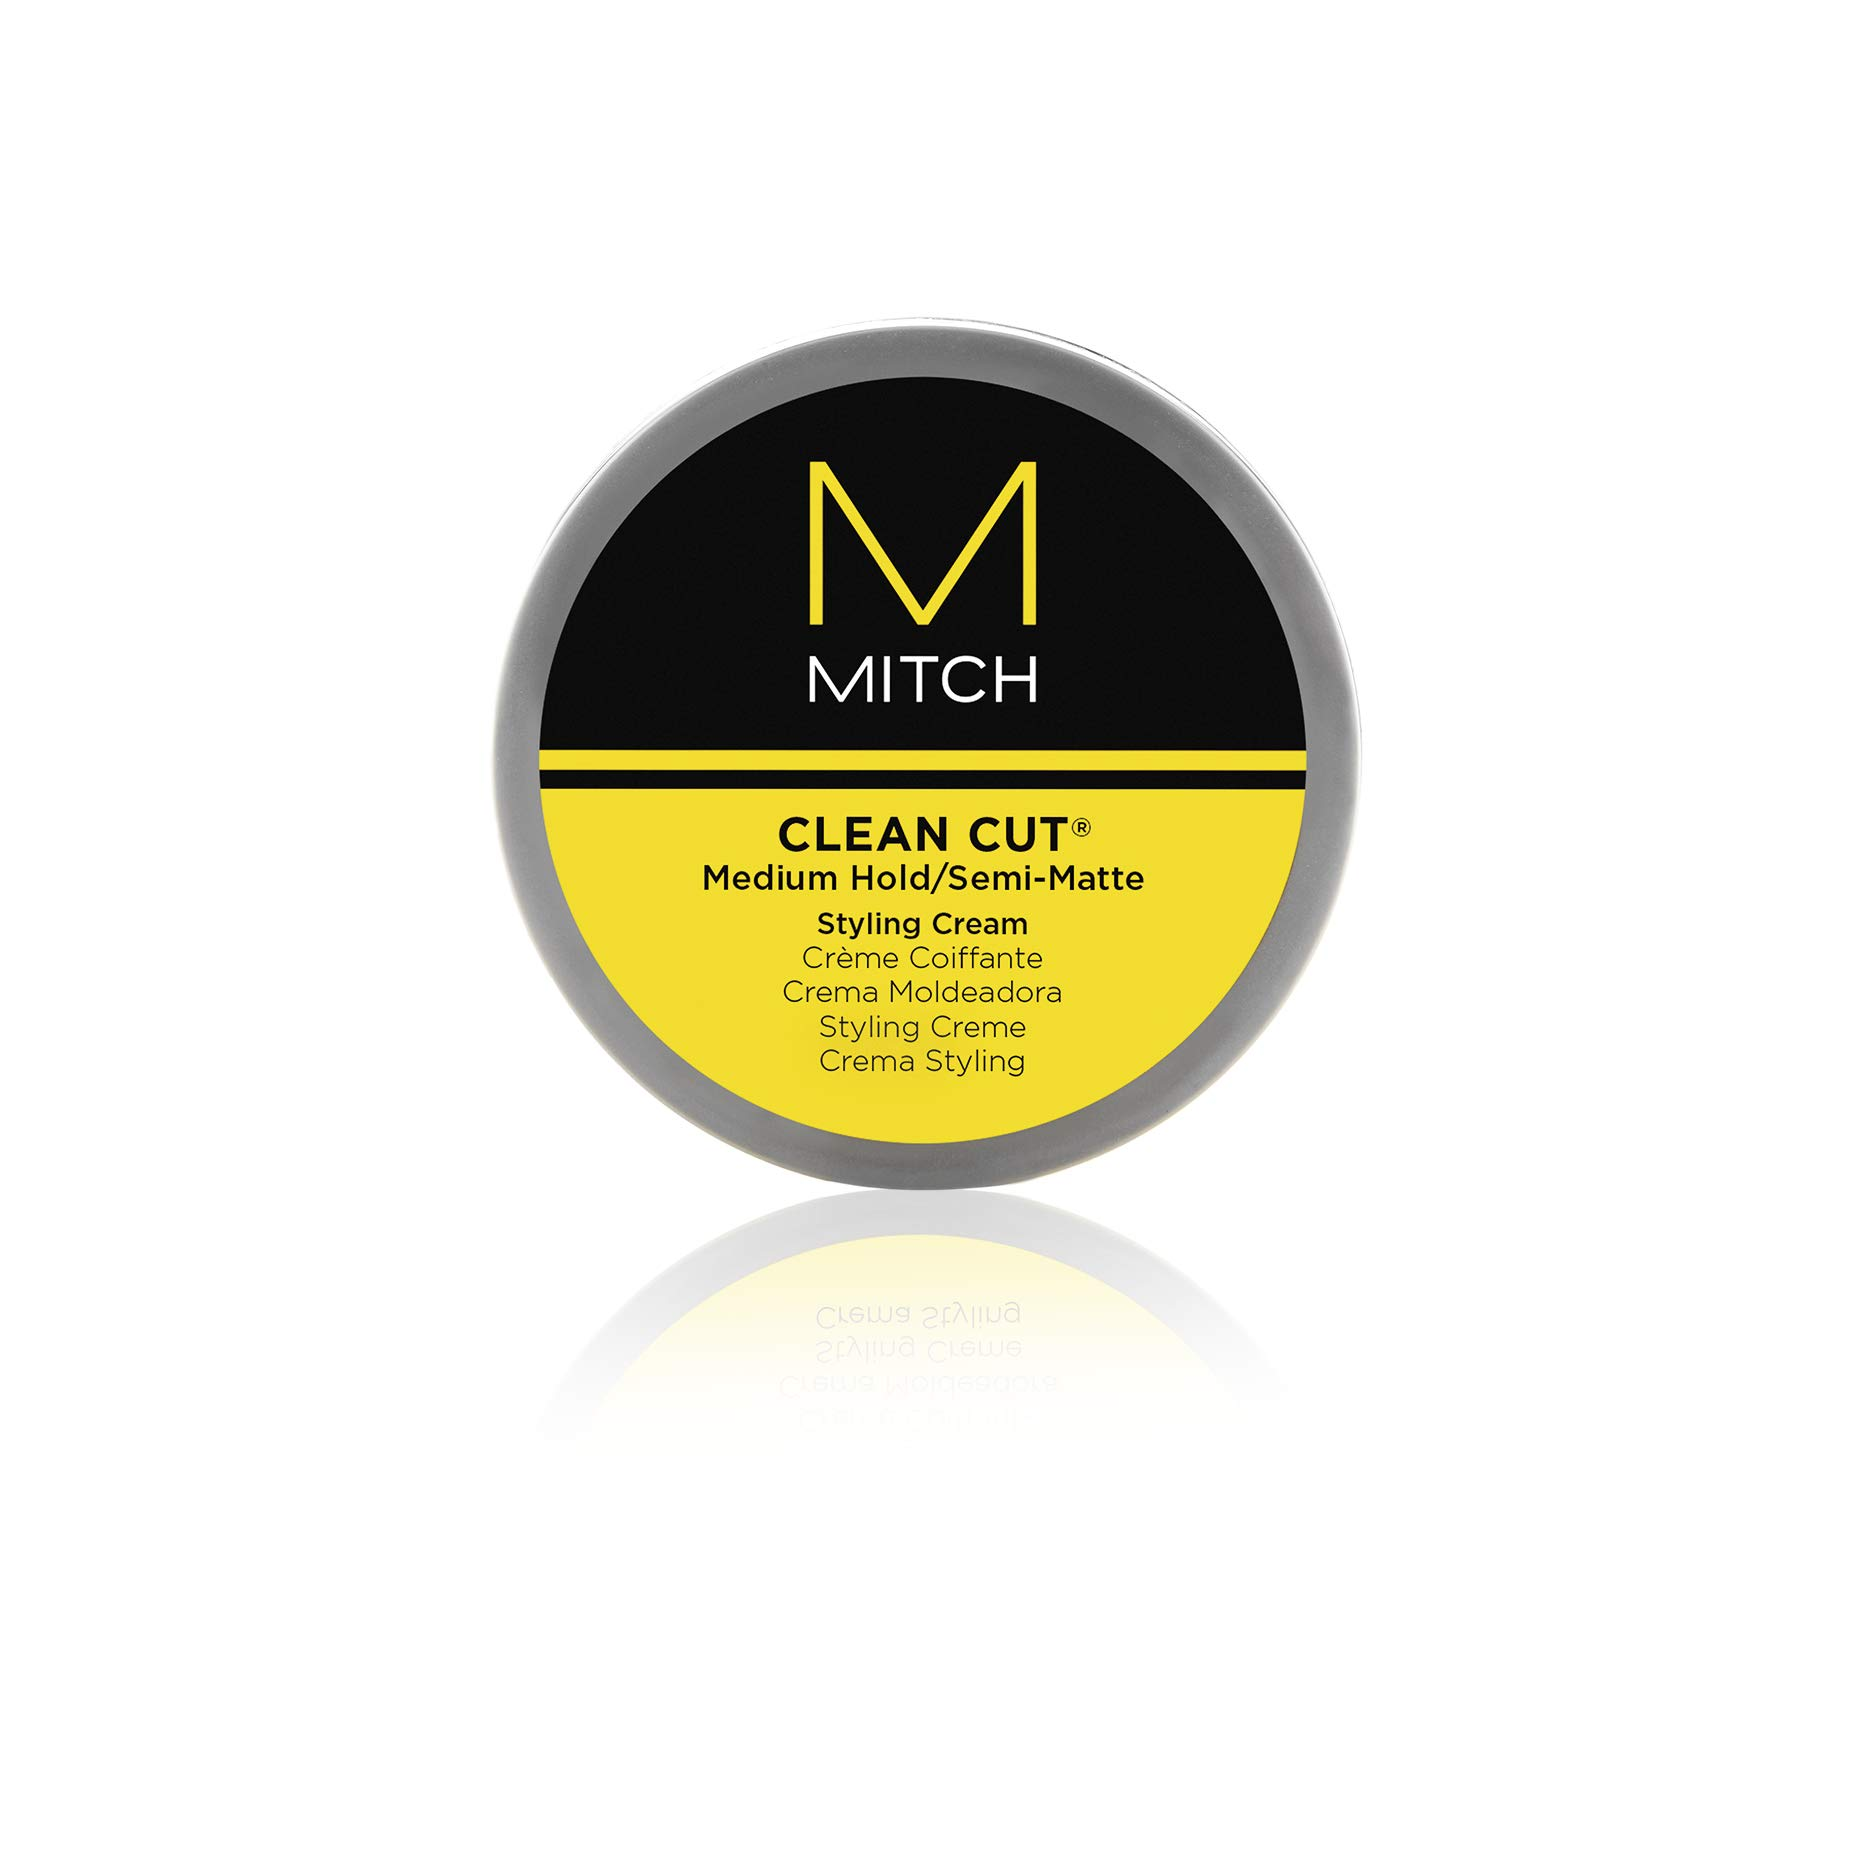 MITCH Clean Cut Styling Hair Cream by Mitch